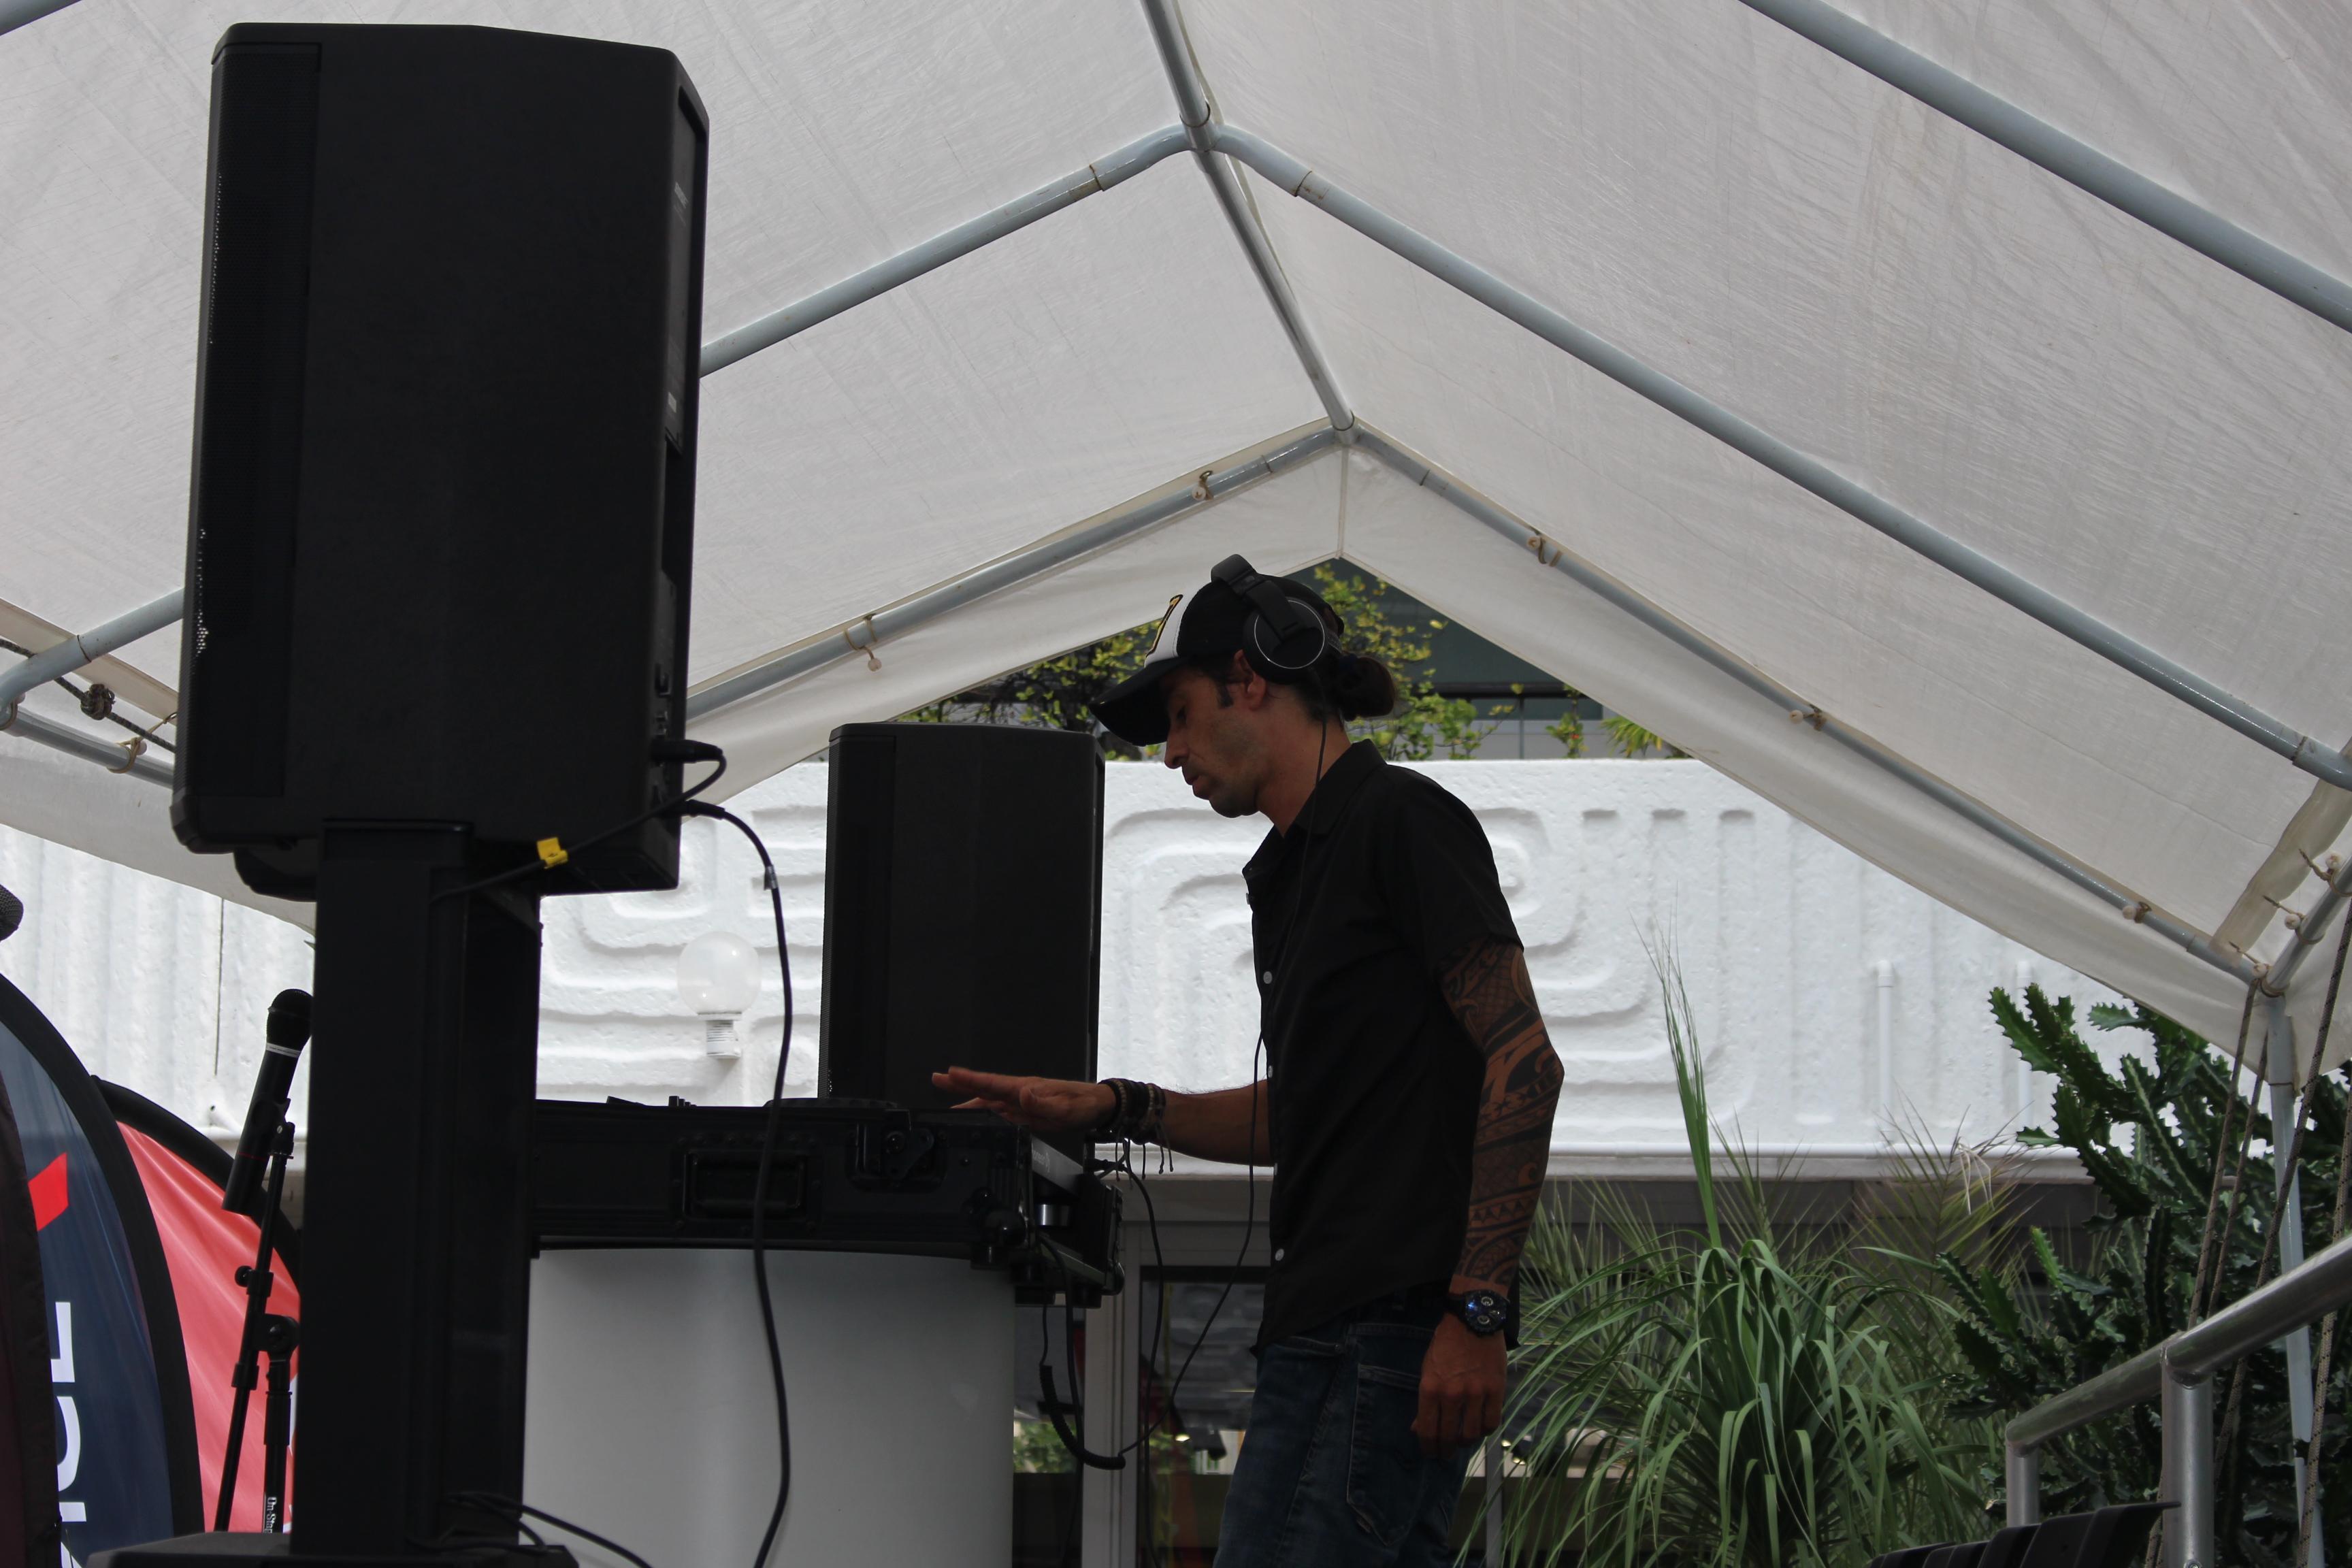 DJ nuno Da Rocha aux platines mercredi midi.